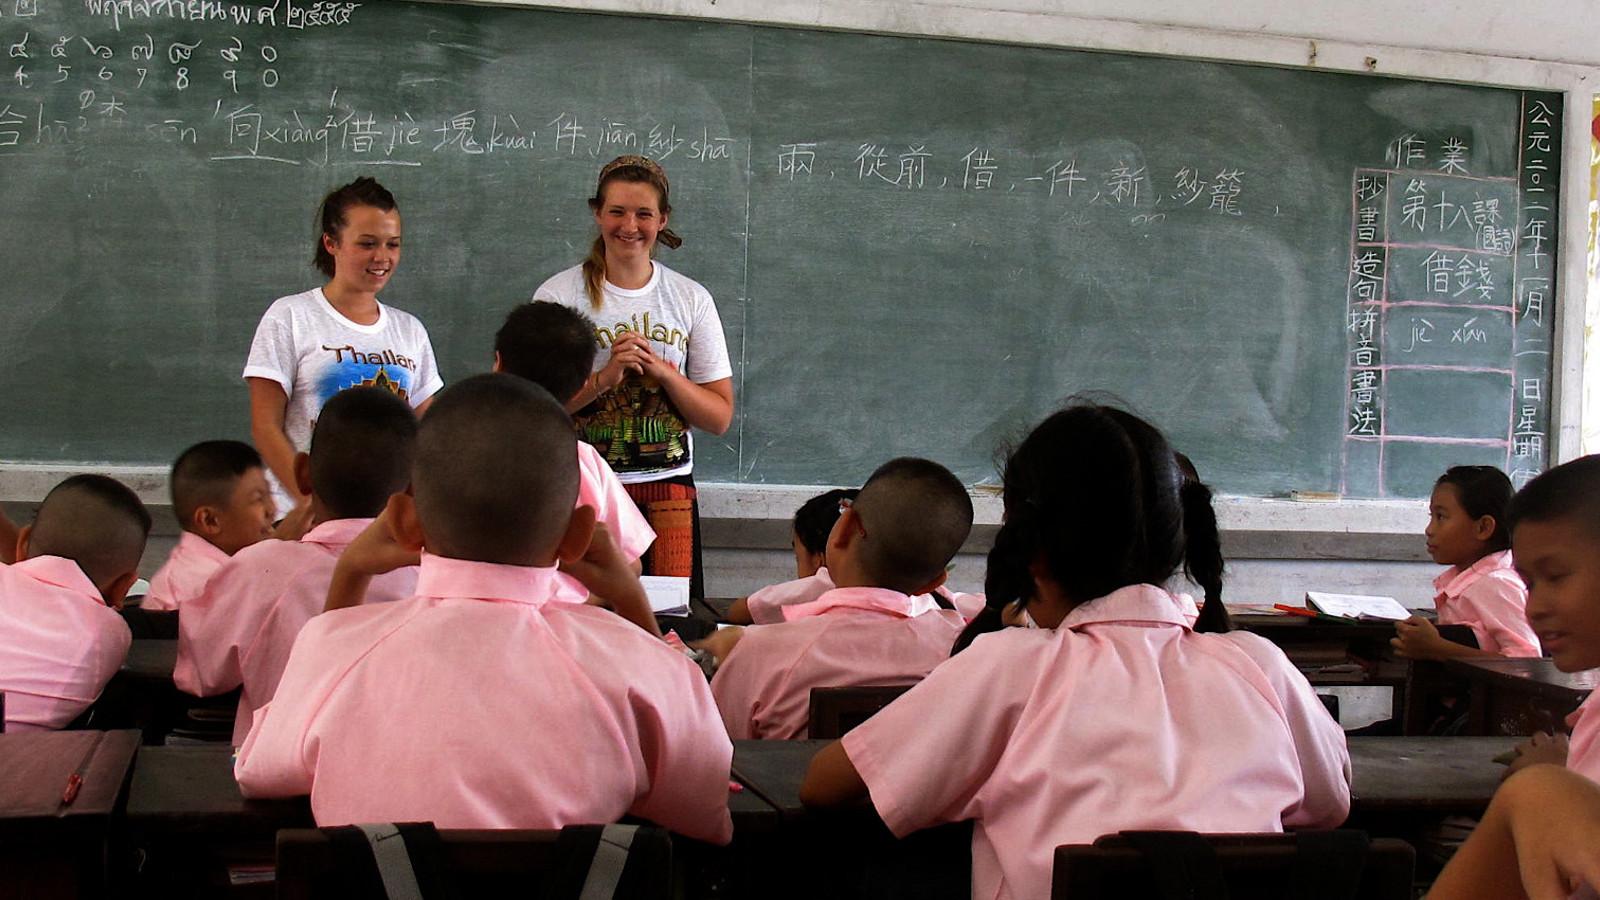 Summer Program - Preserving the Environment   ARCC Programs   Thailand: Elephant & Islands